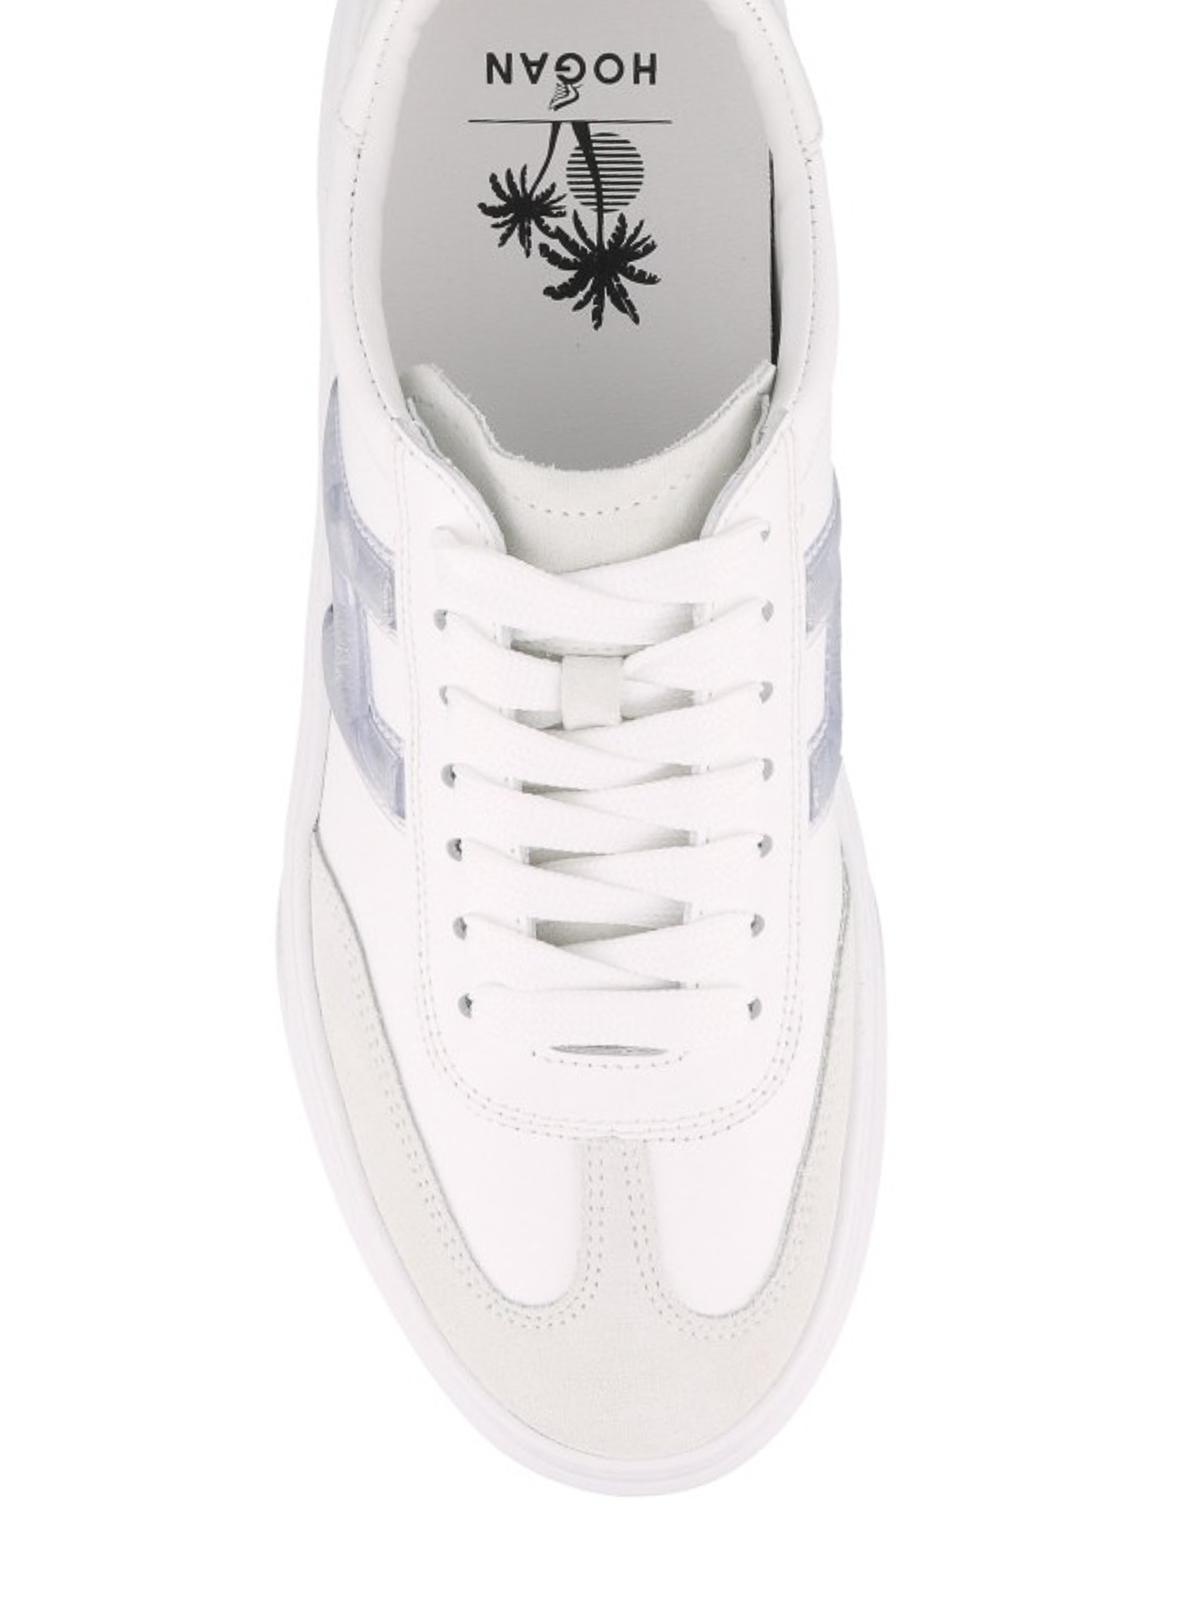 Hogan - Sneaker H365 in pelle e suede - sneakers - HXW3650BJ50KGYB001